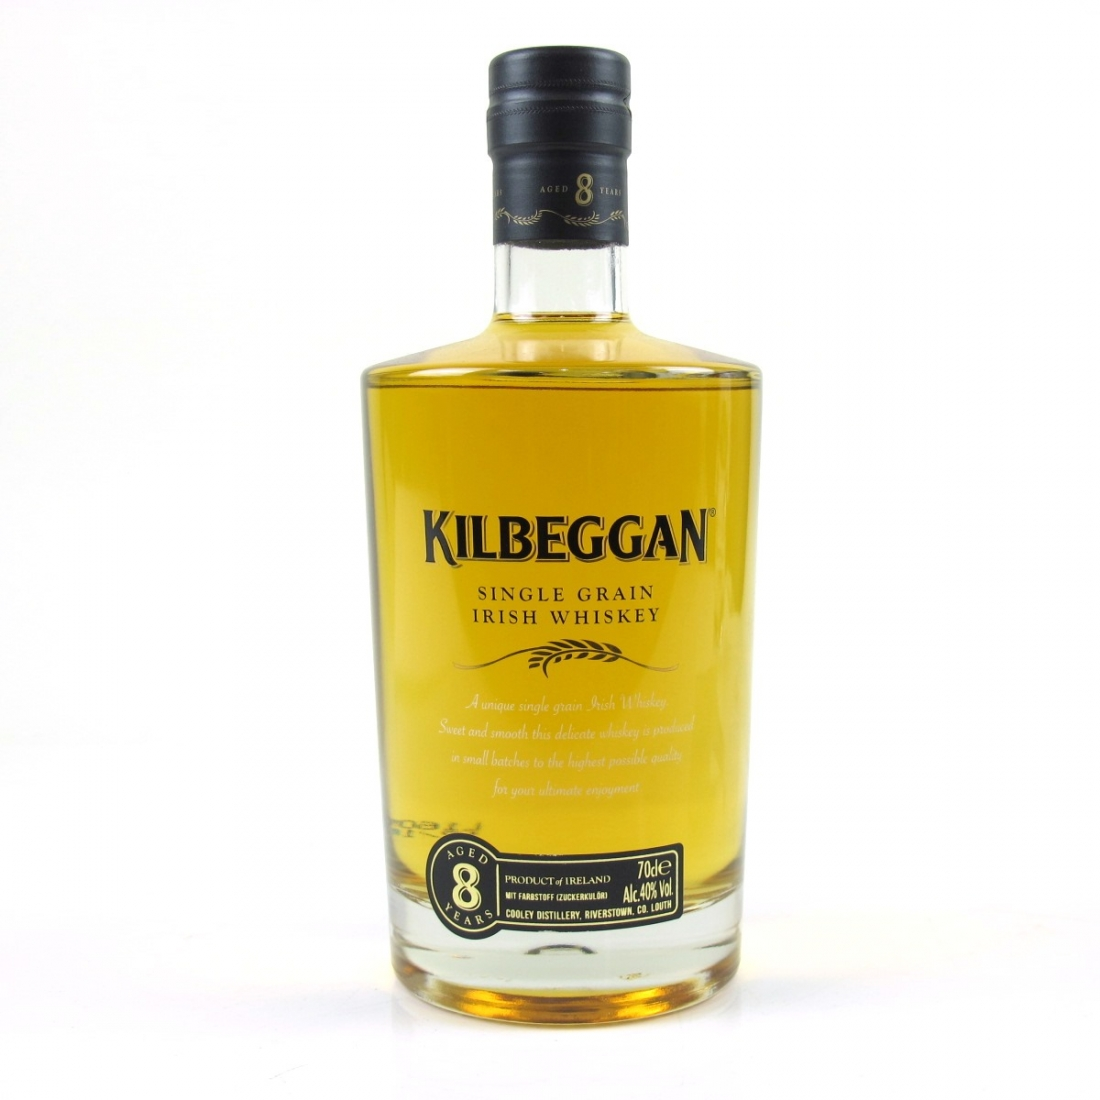 Kilbeggan 8 Year Old